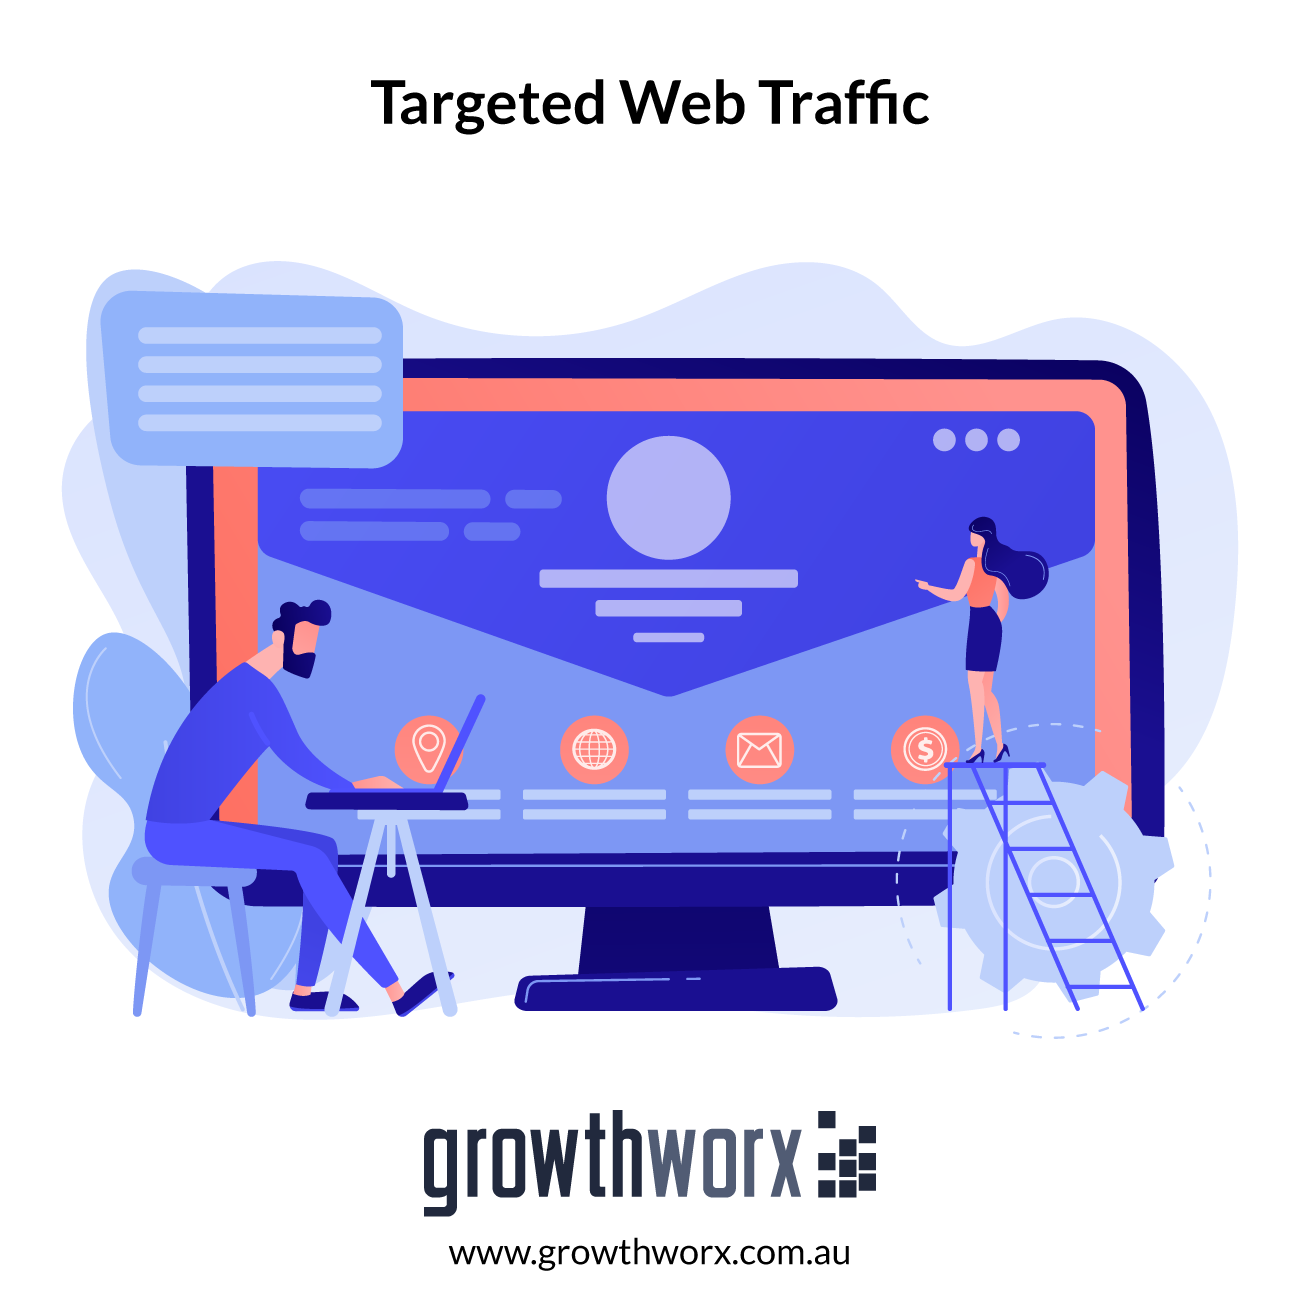 I will bring real usa,uk,aus targeted web traffic 1